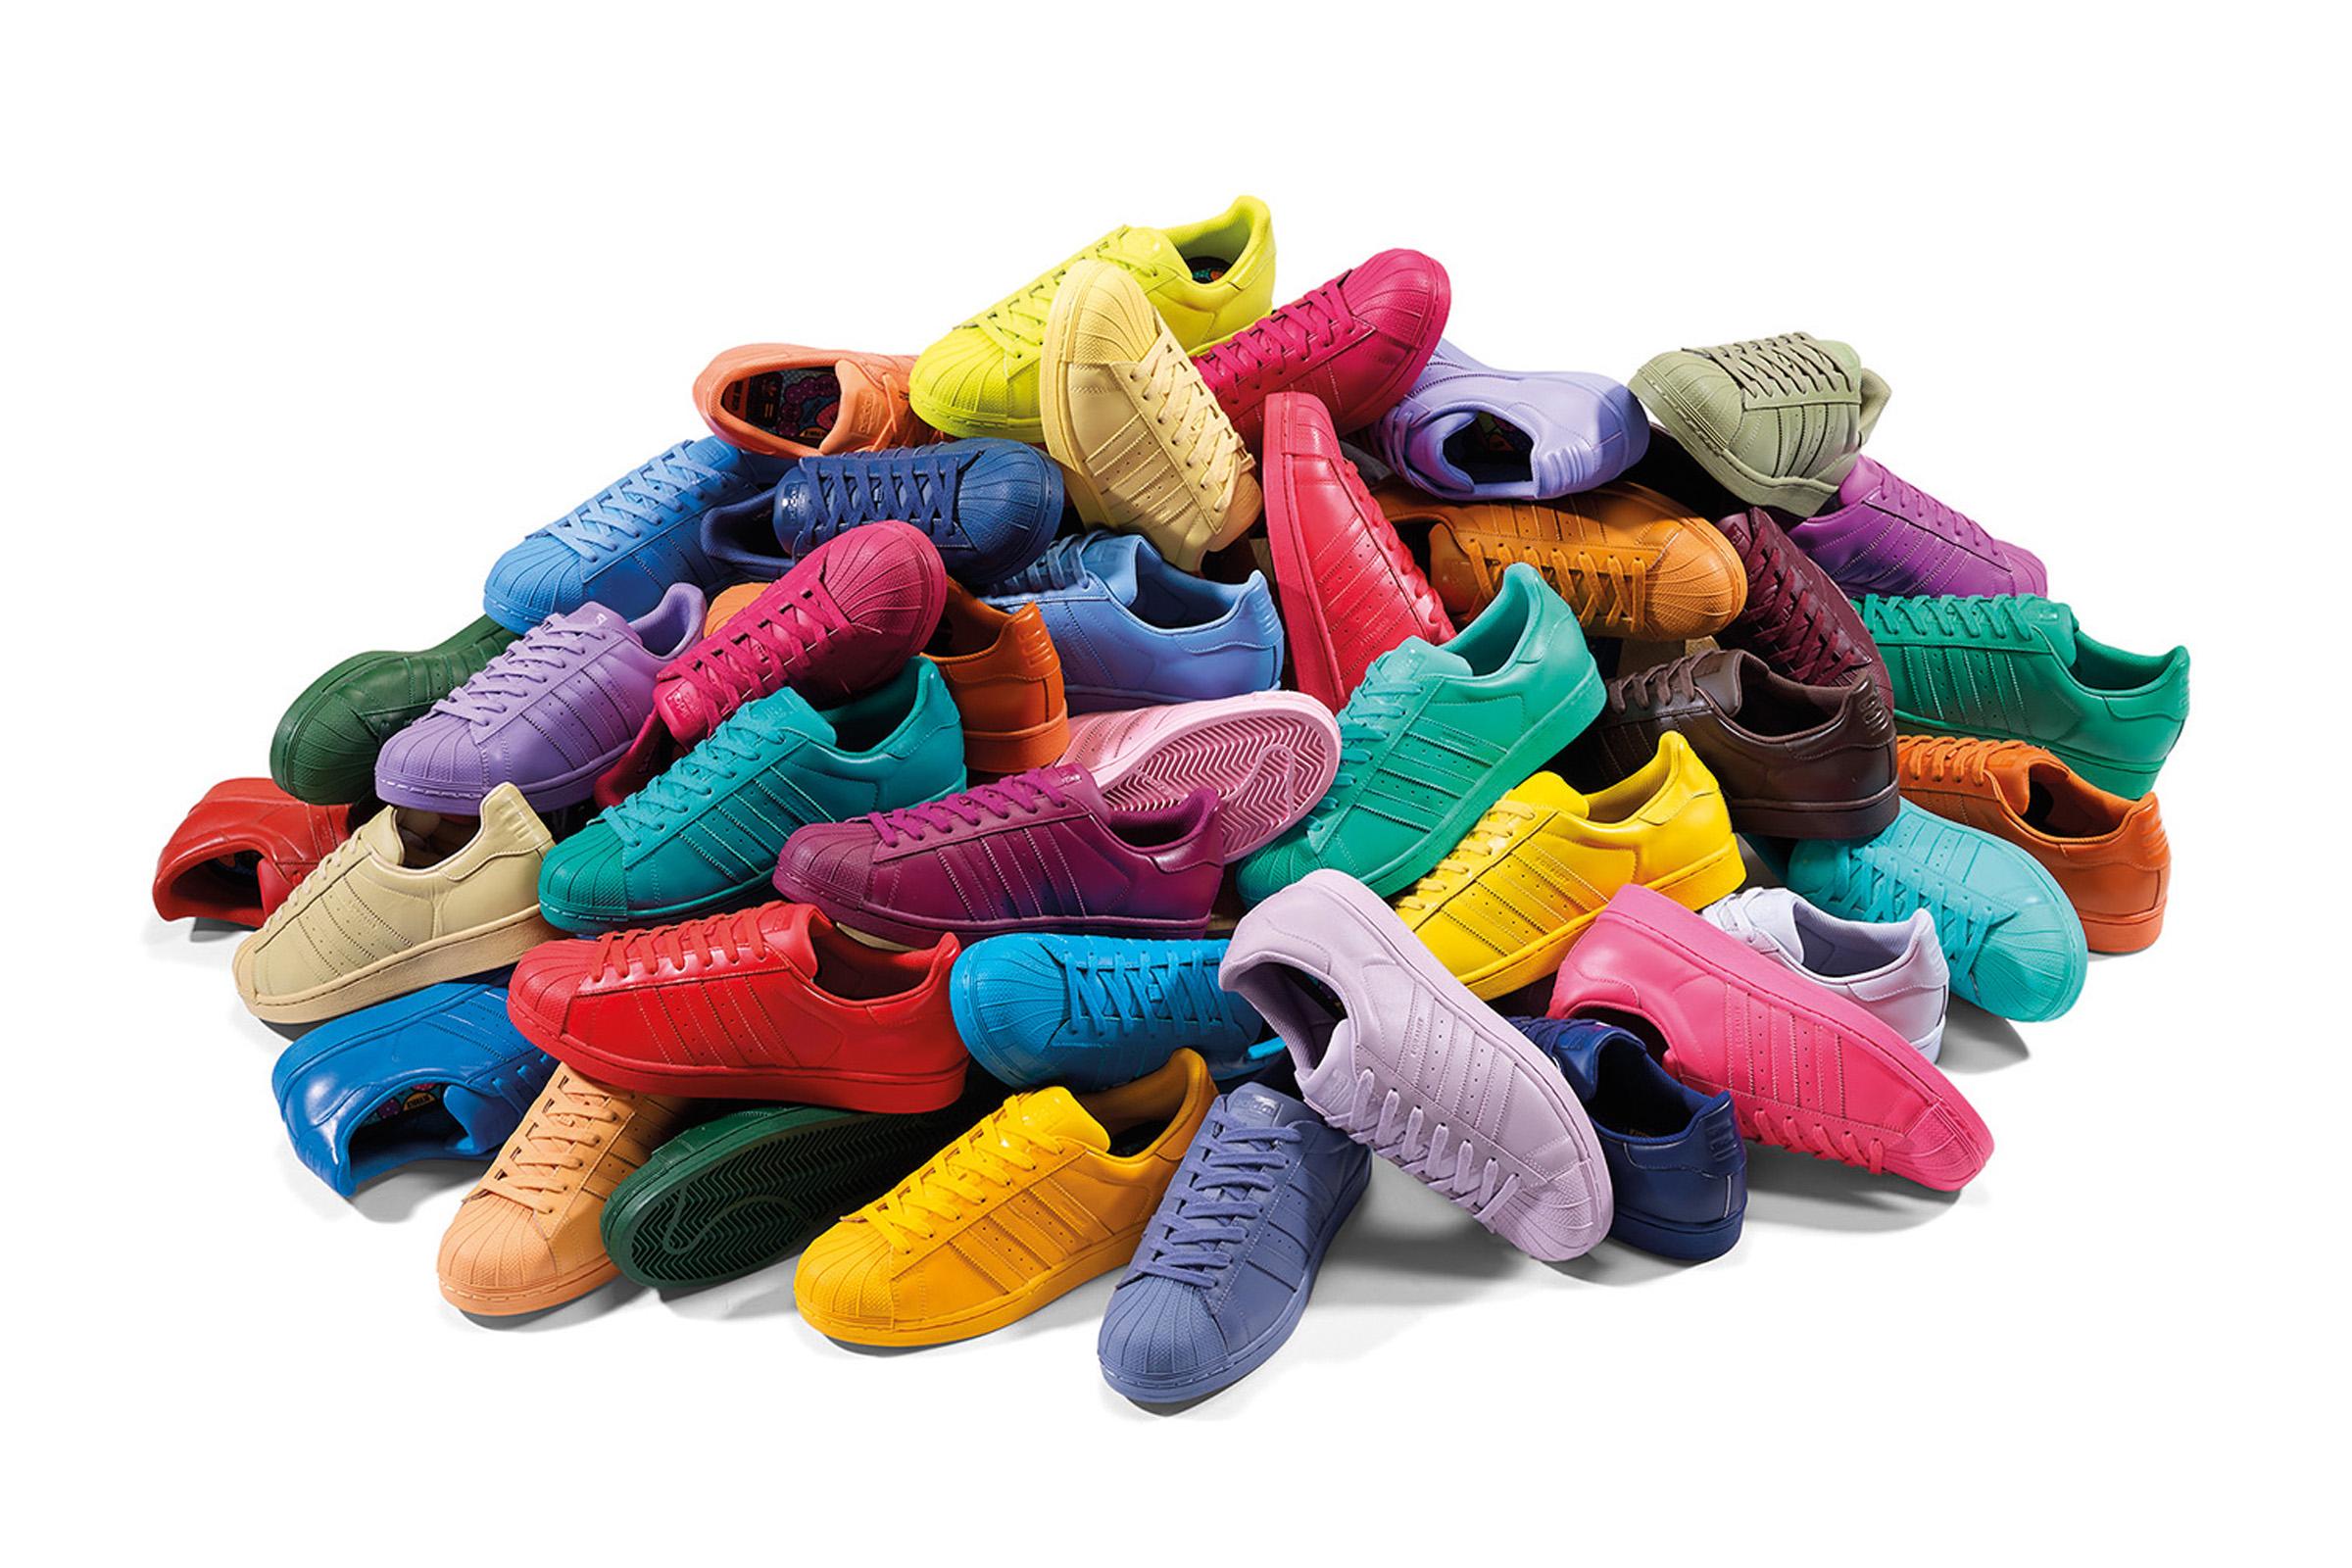 aaa1c00470195a Did adidas Really Jump Over the Jumpman  - Adidas Jordan Brand Sales Resell